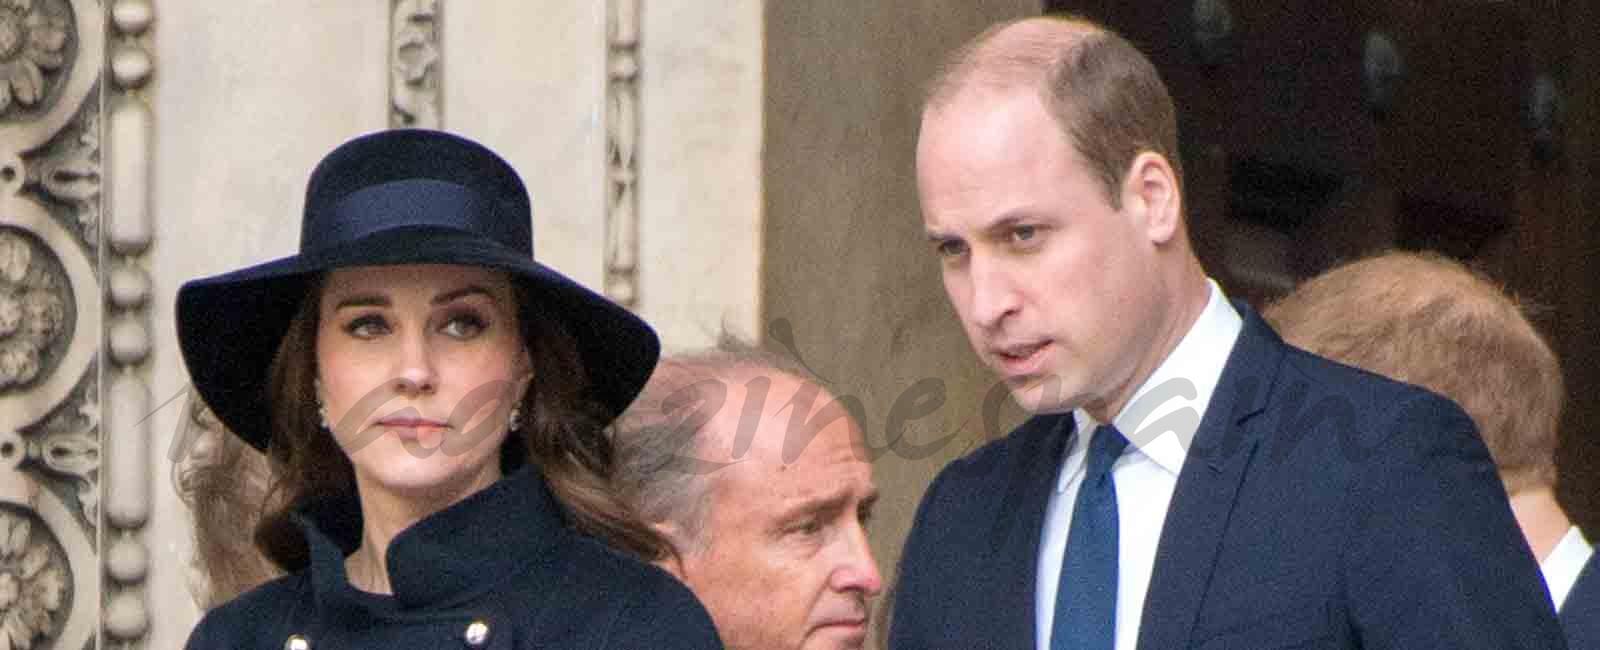 Kate Middleton apuesta por Carolina Herrera